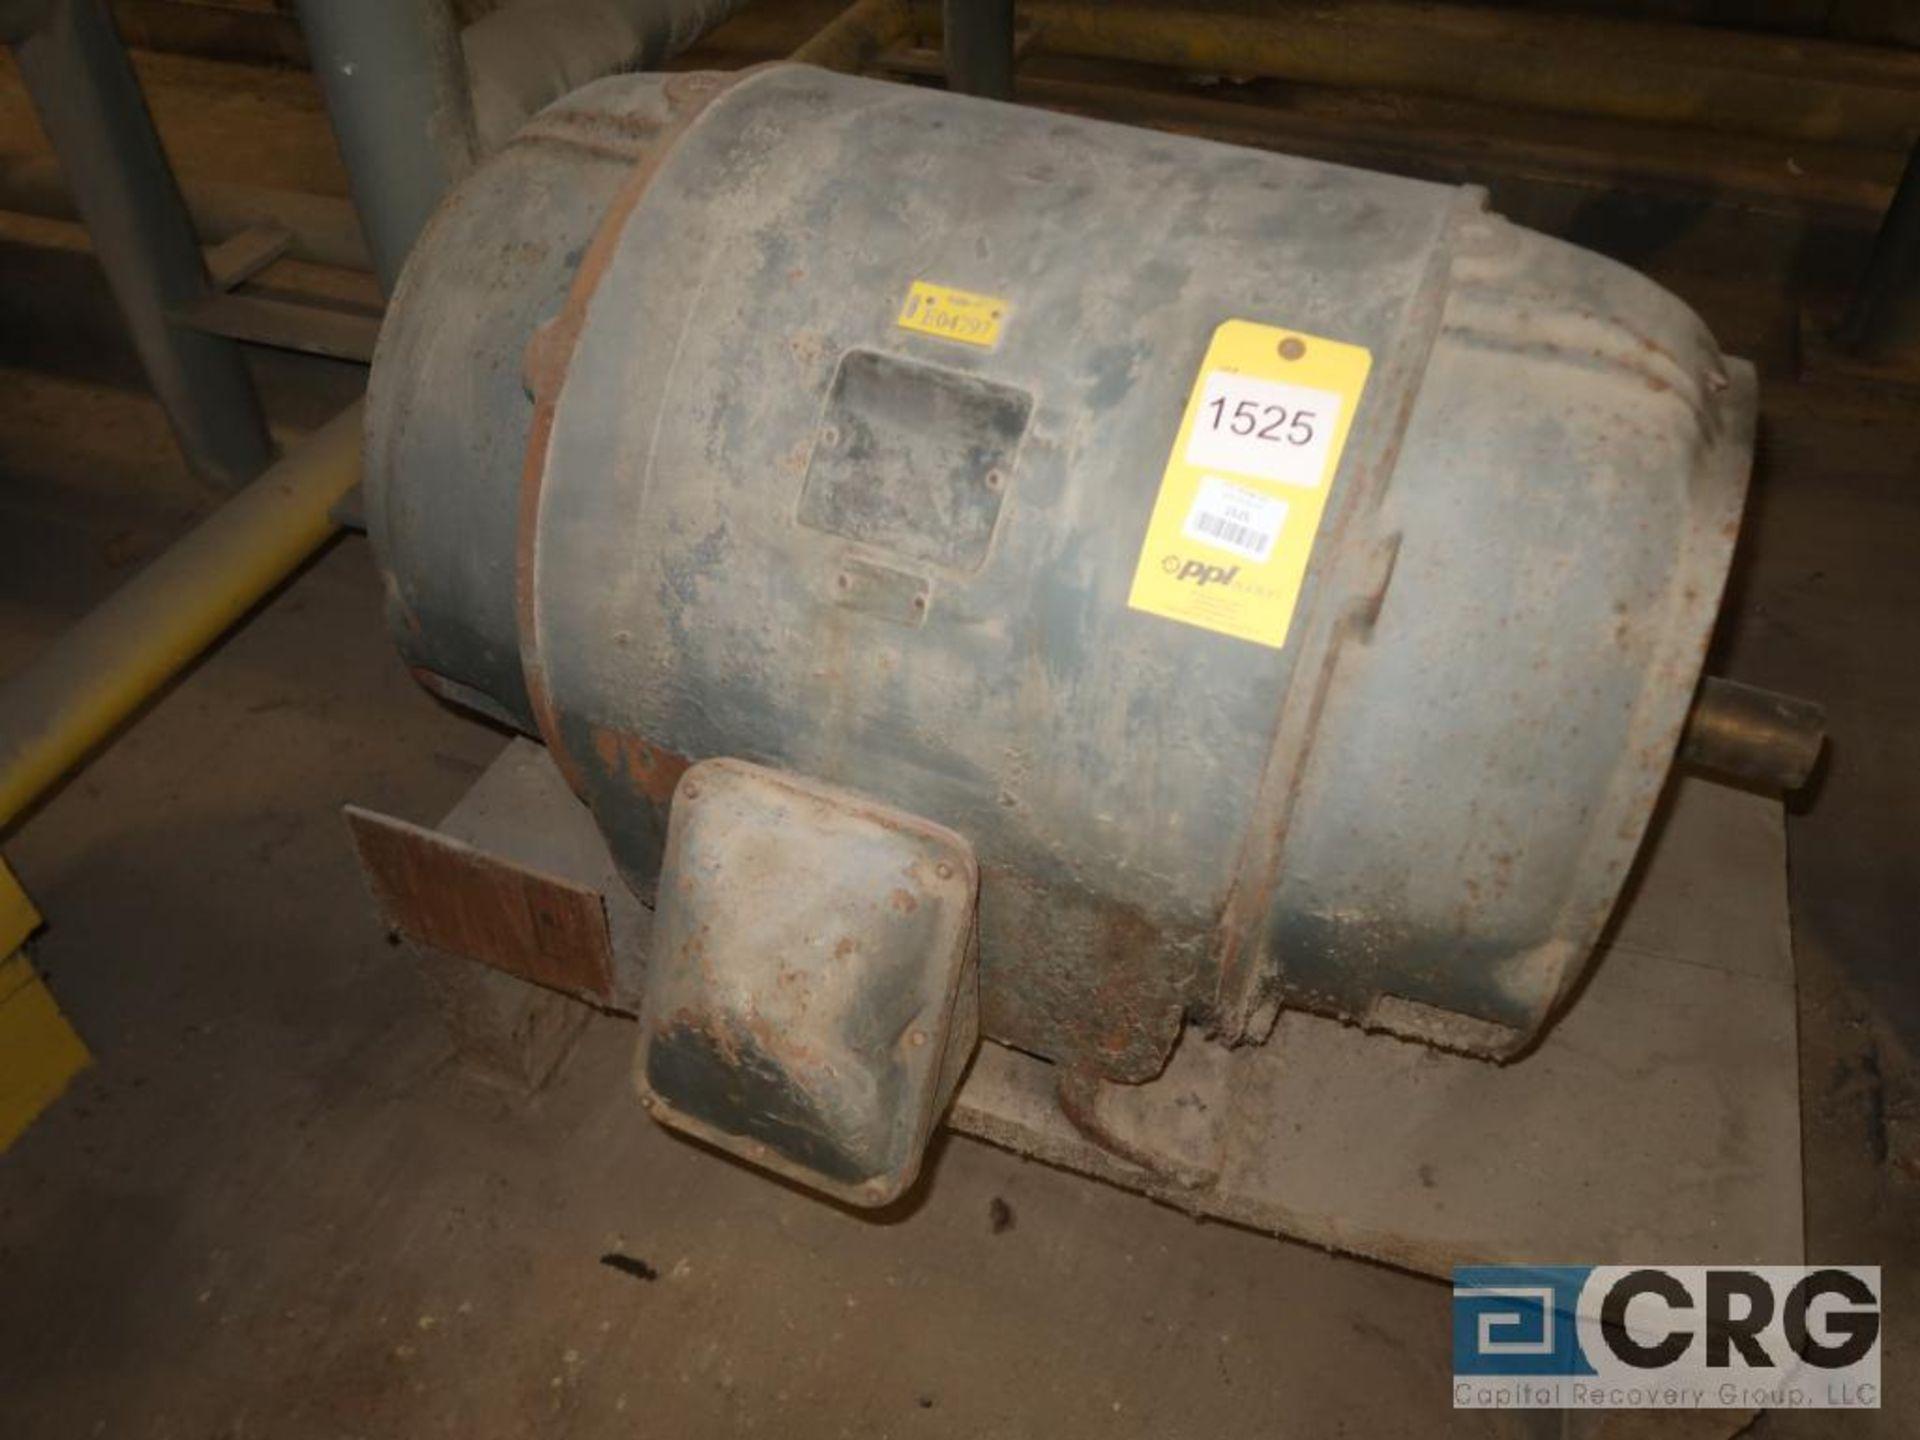 Motor, 200 HP, equipment #E04797 (496 Dock Area)